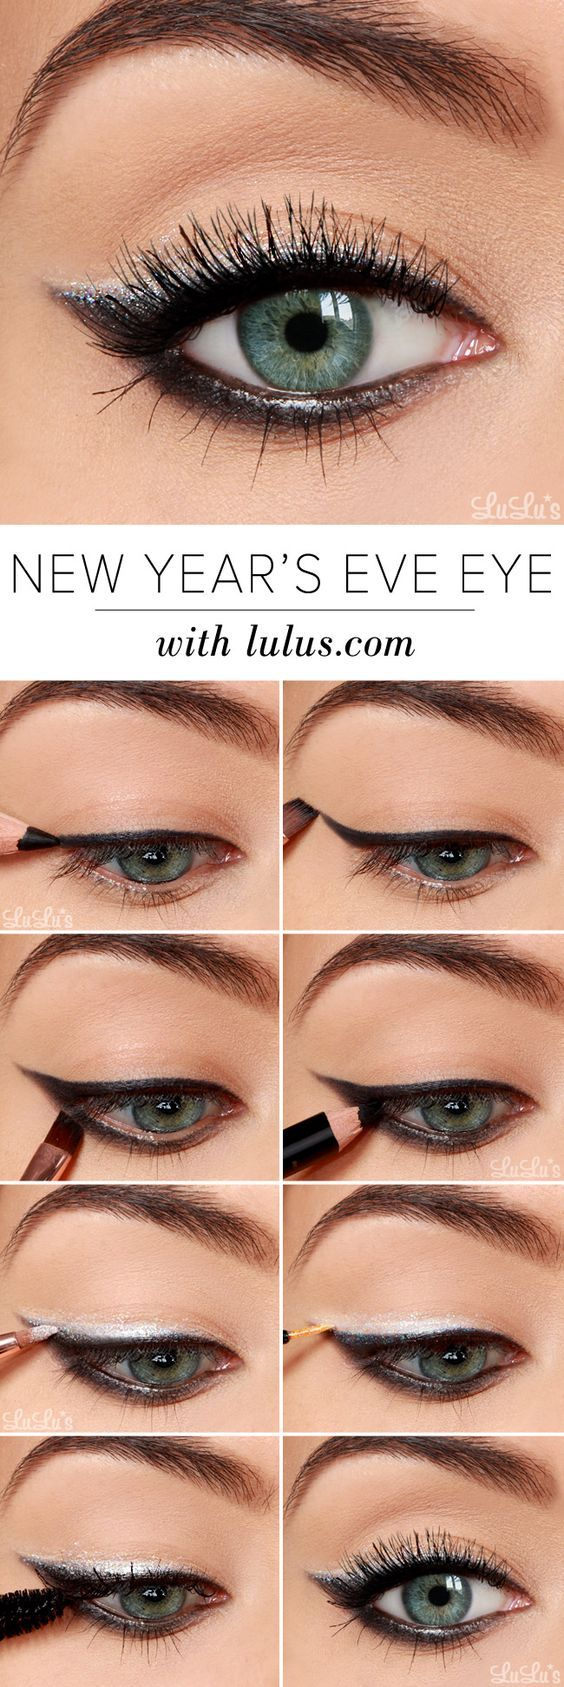 Lulus How To New Year s Eve Eyeshadow Tutorial